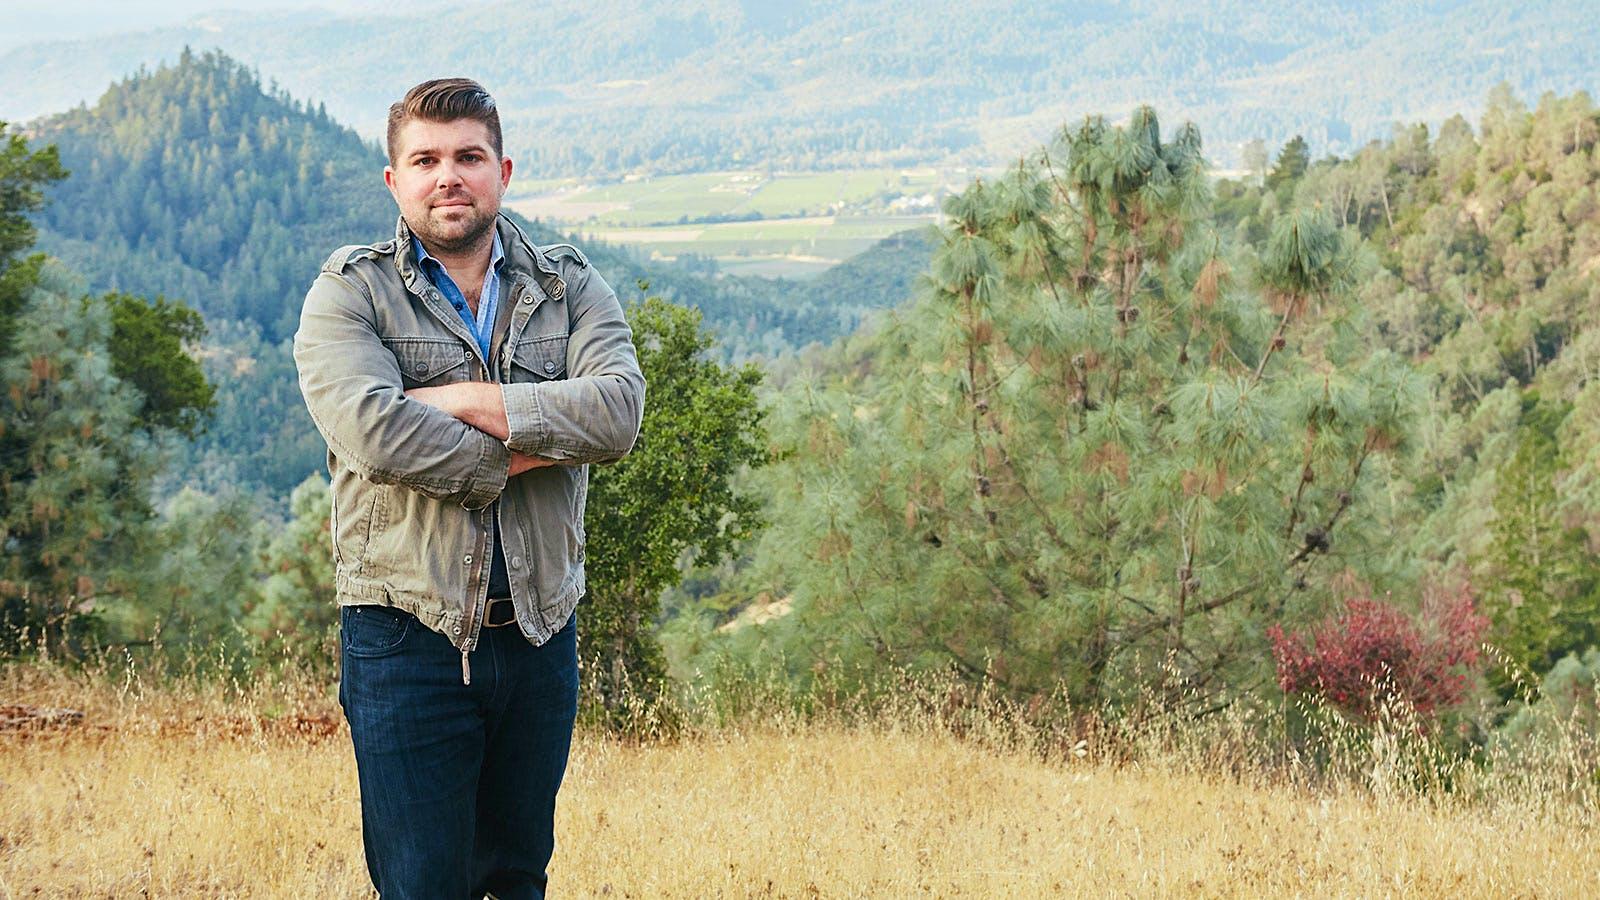 Is Oregon Wine Afraid of Meiomi-zation?